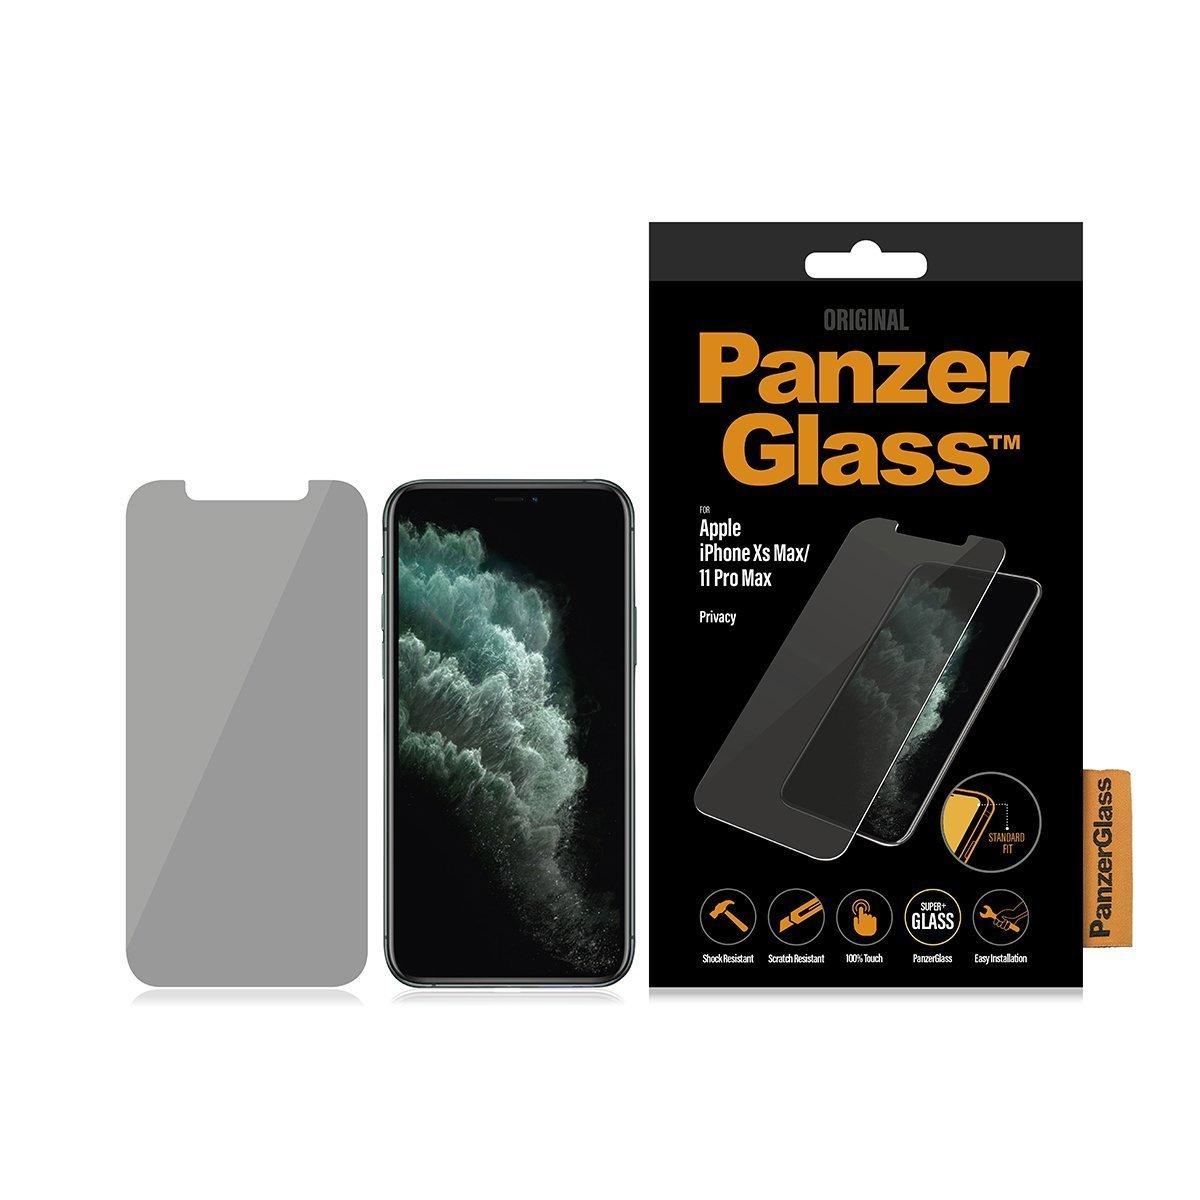 PanzerGlass P2663 protector de pantalla Protector de pantalla anti-reflejante Teléfono móvil/smartphone Apple 1 pieza(s)